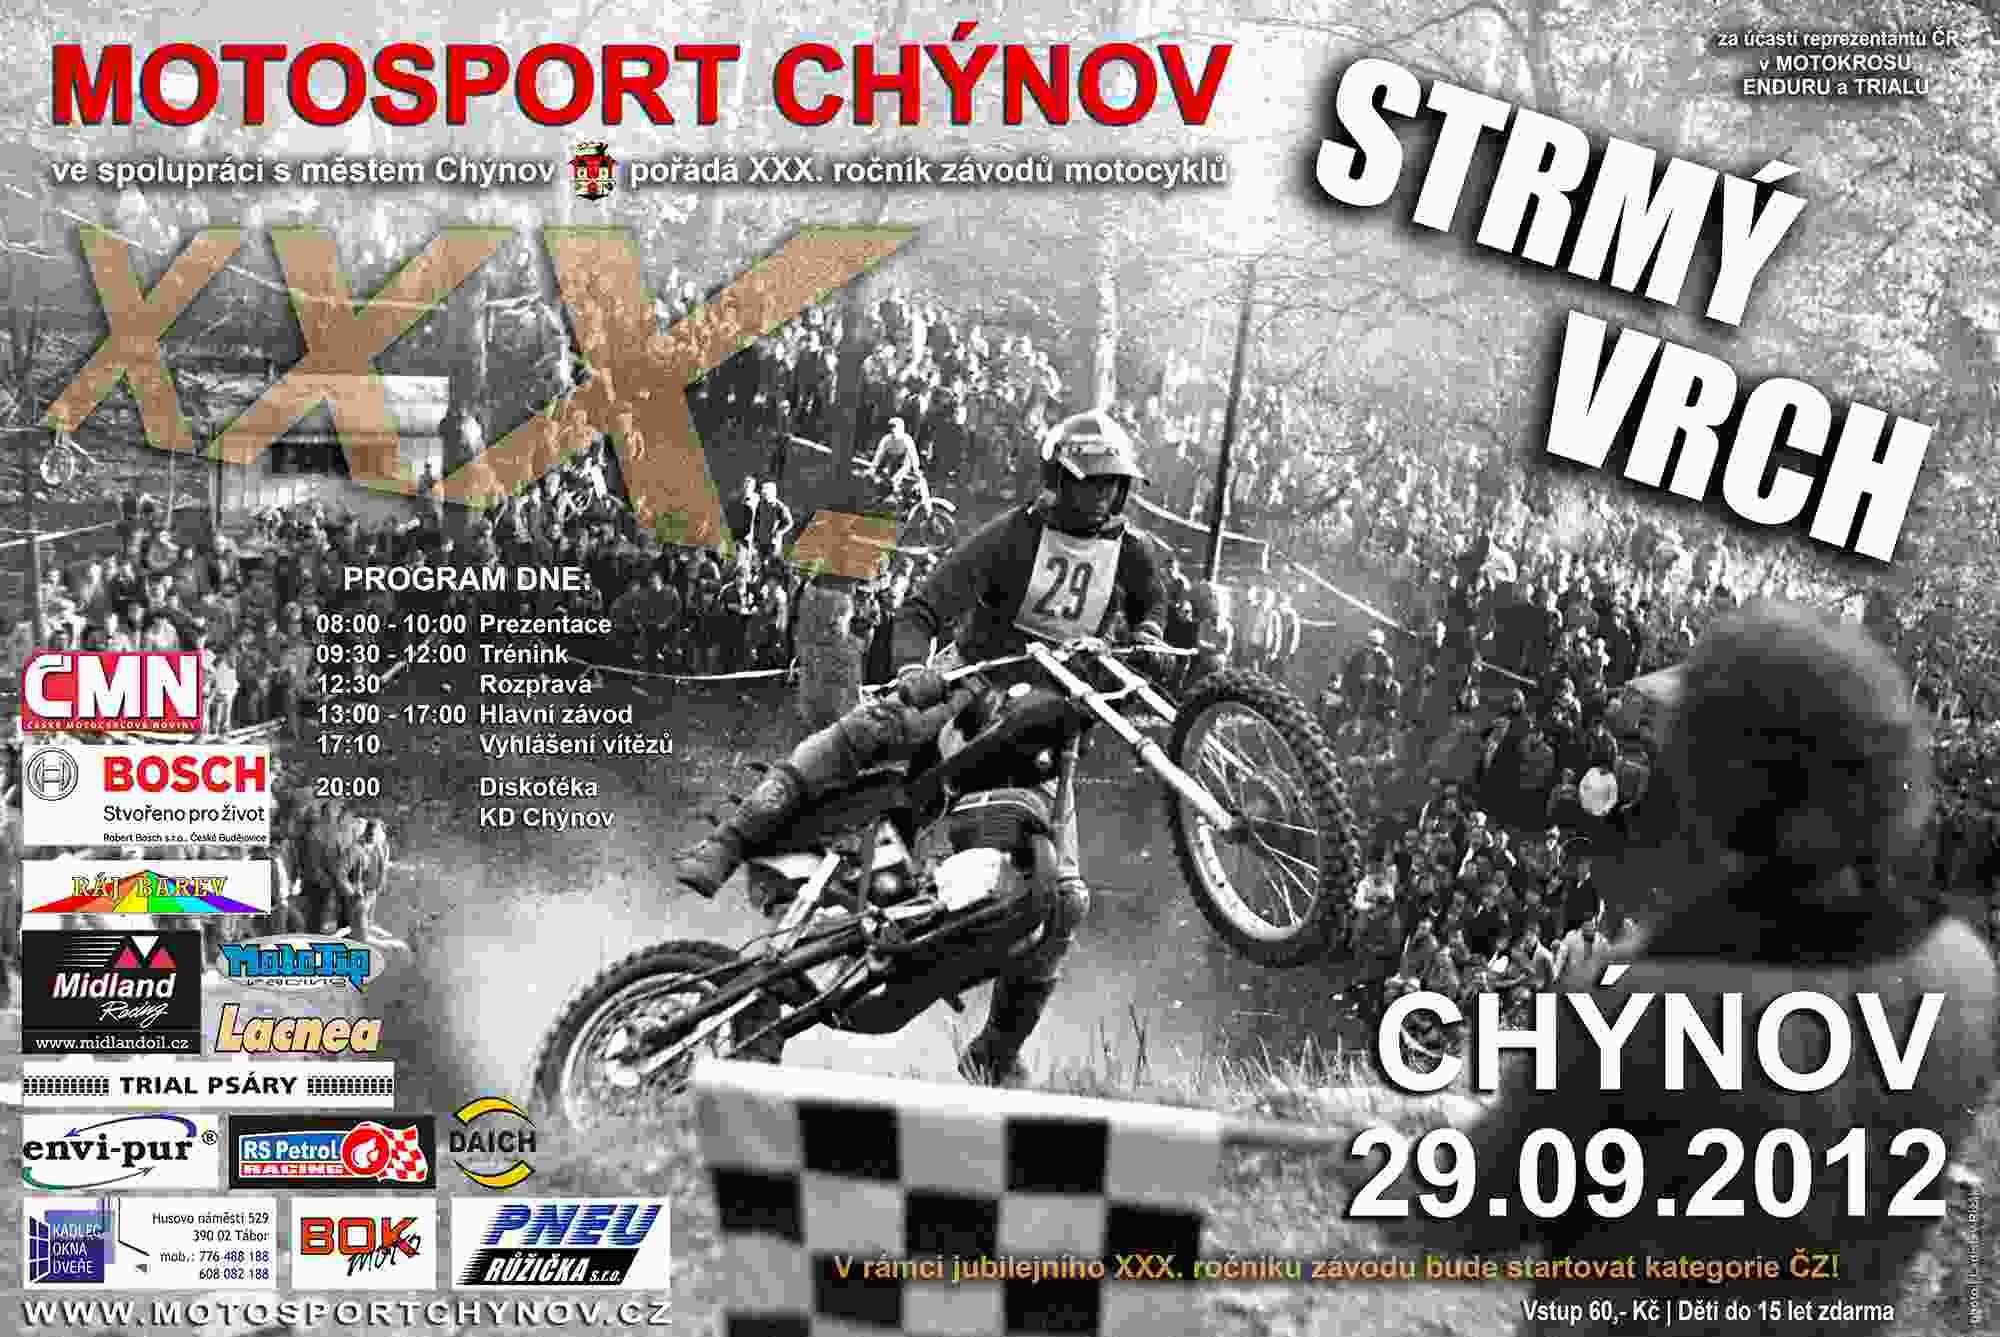 http://www.motosportchynov.cz/images/vrch.jpg